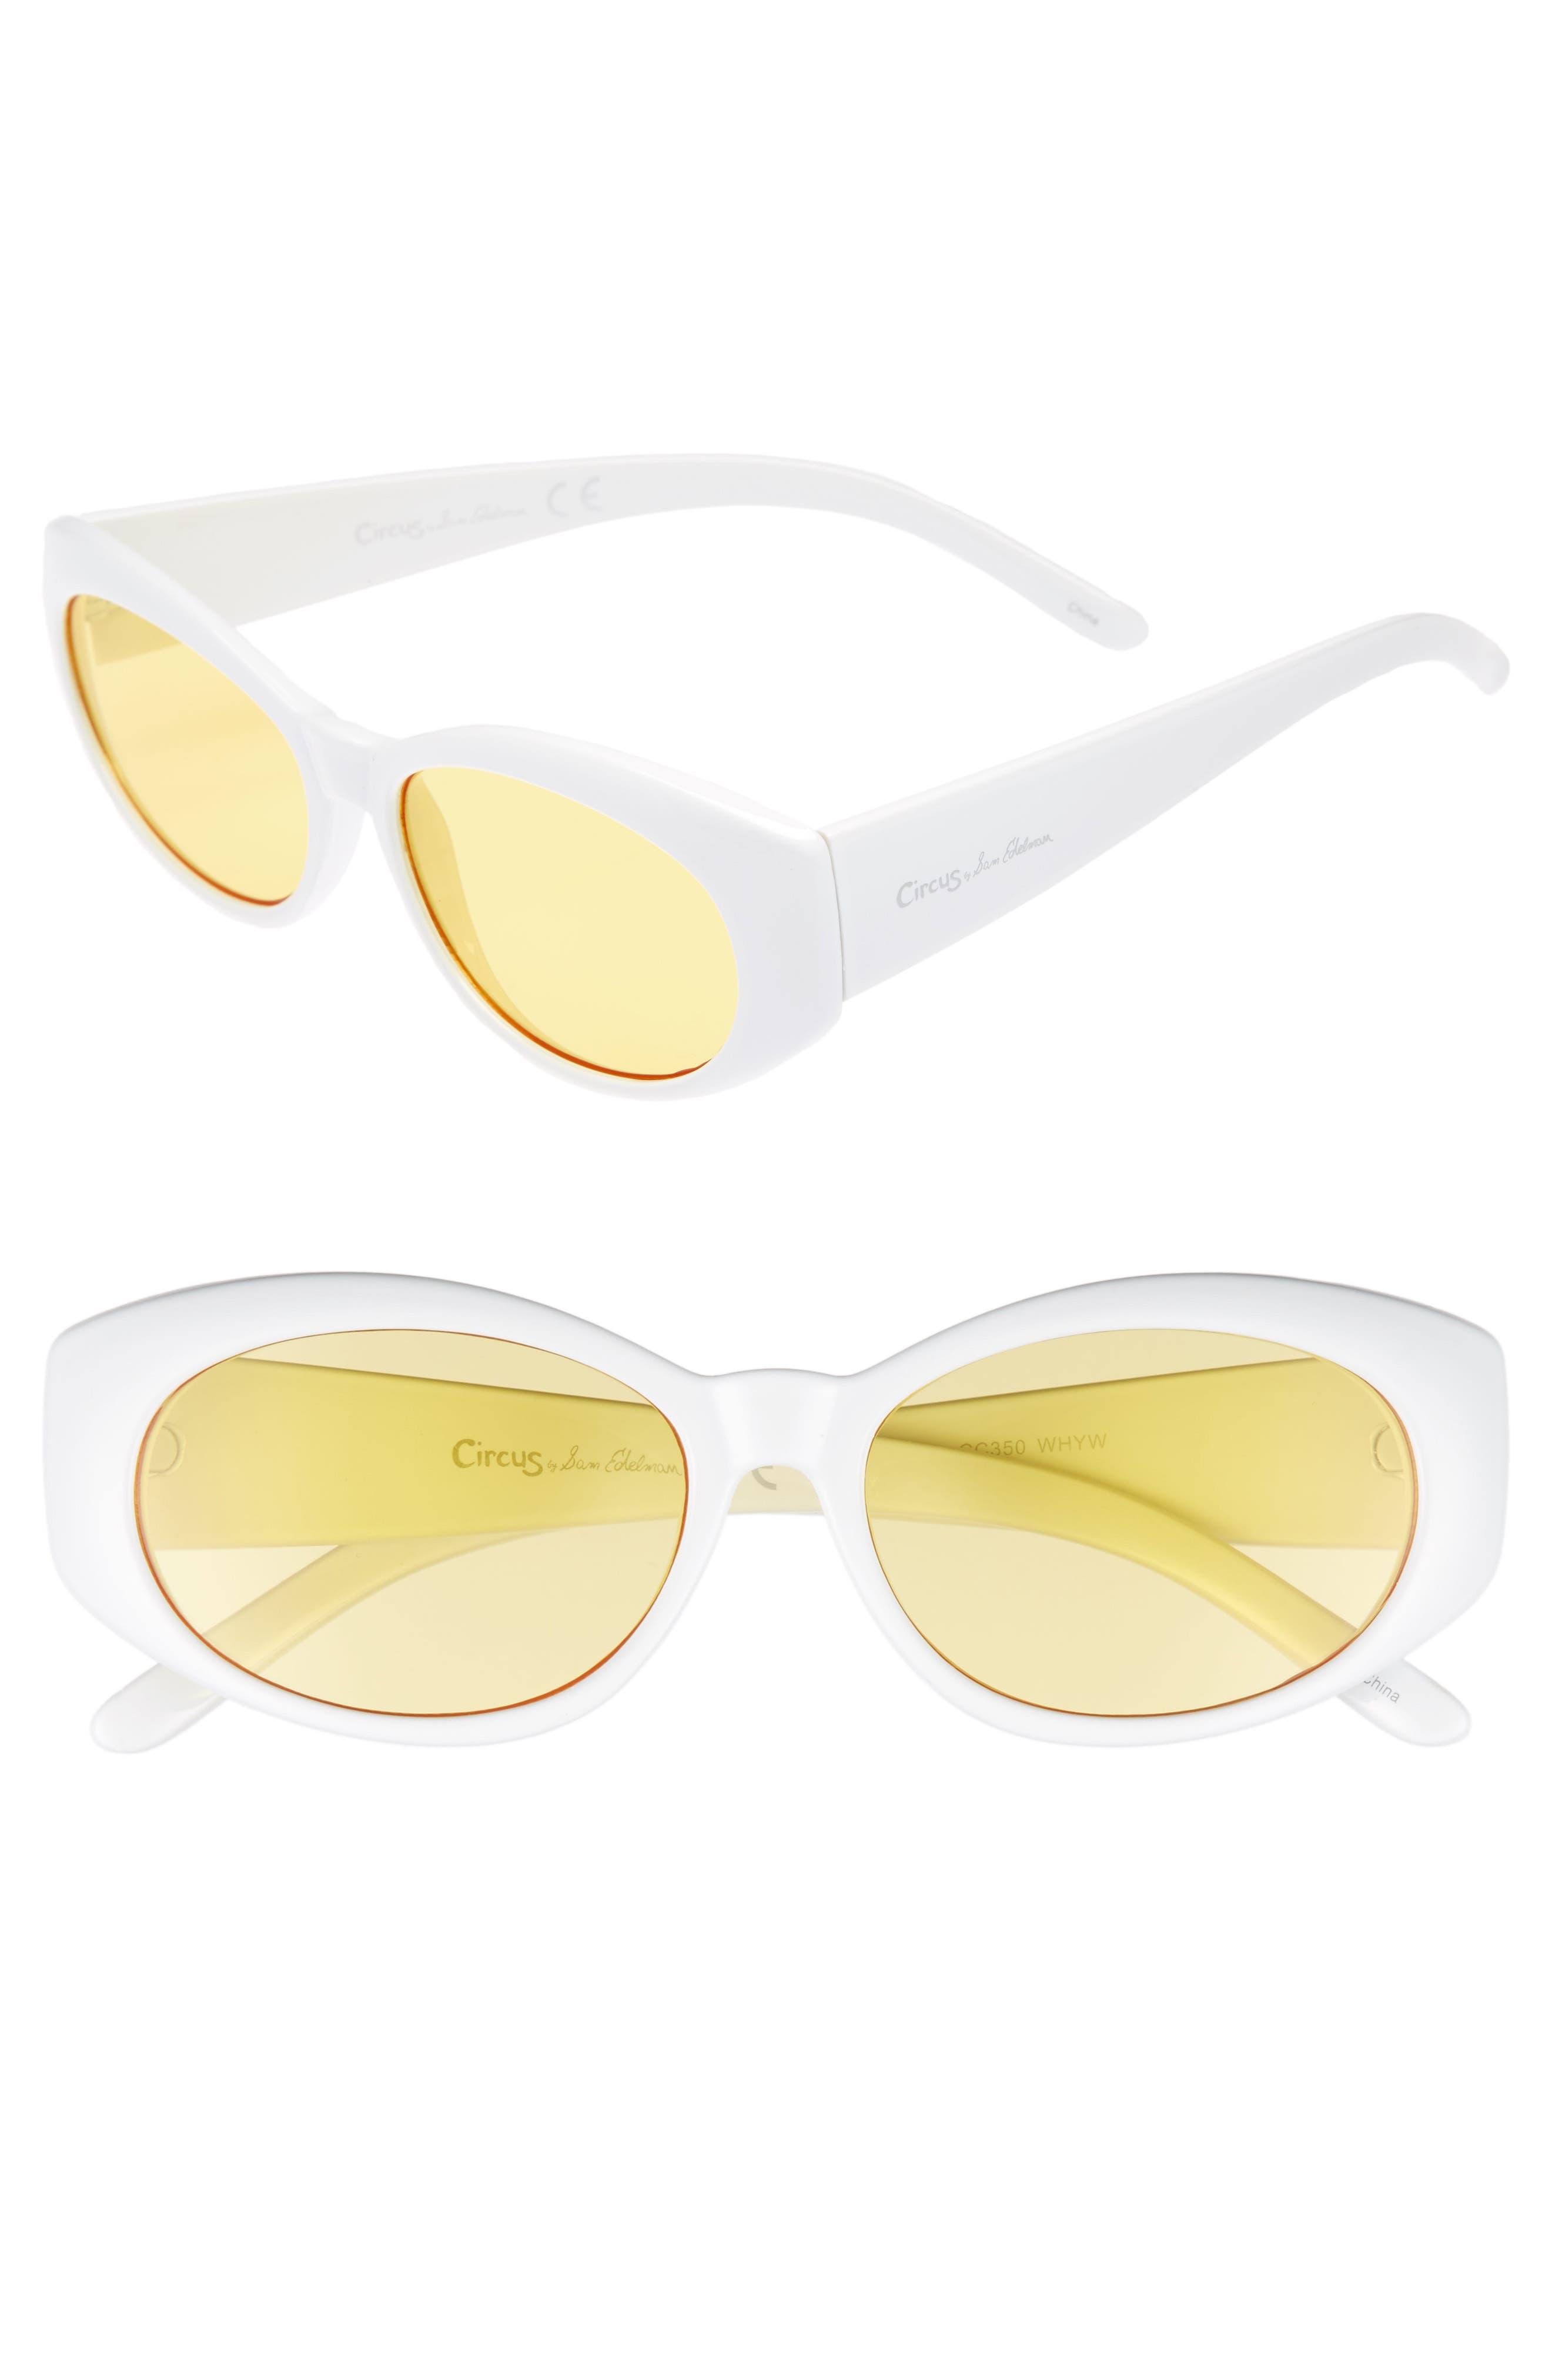 68mm Oval Sunglasses,                             Main thumbnail 1, color,                             102